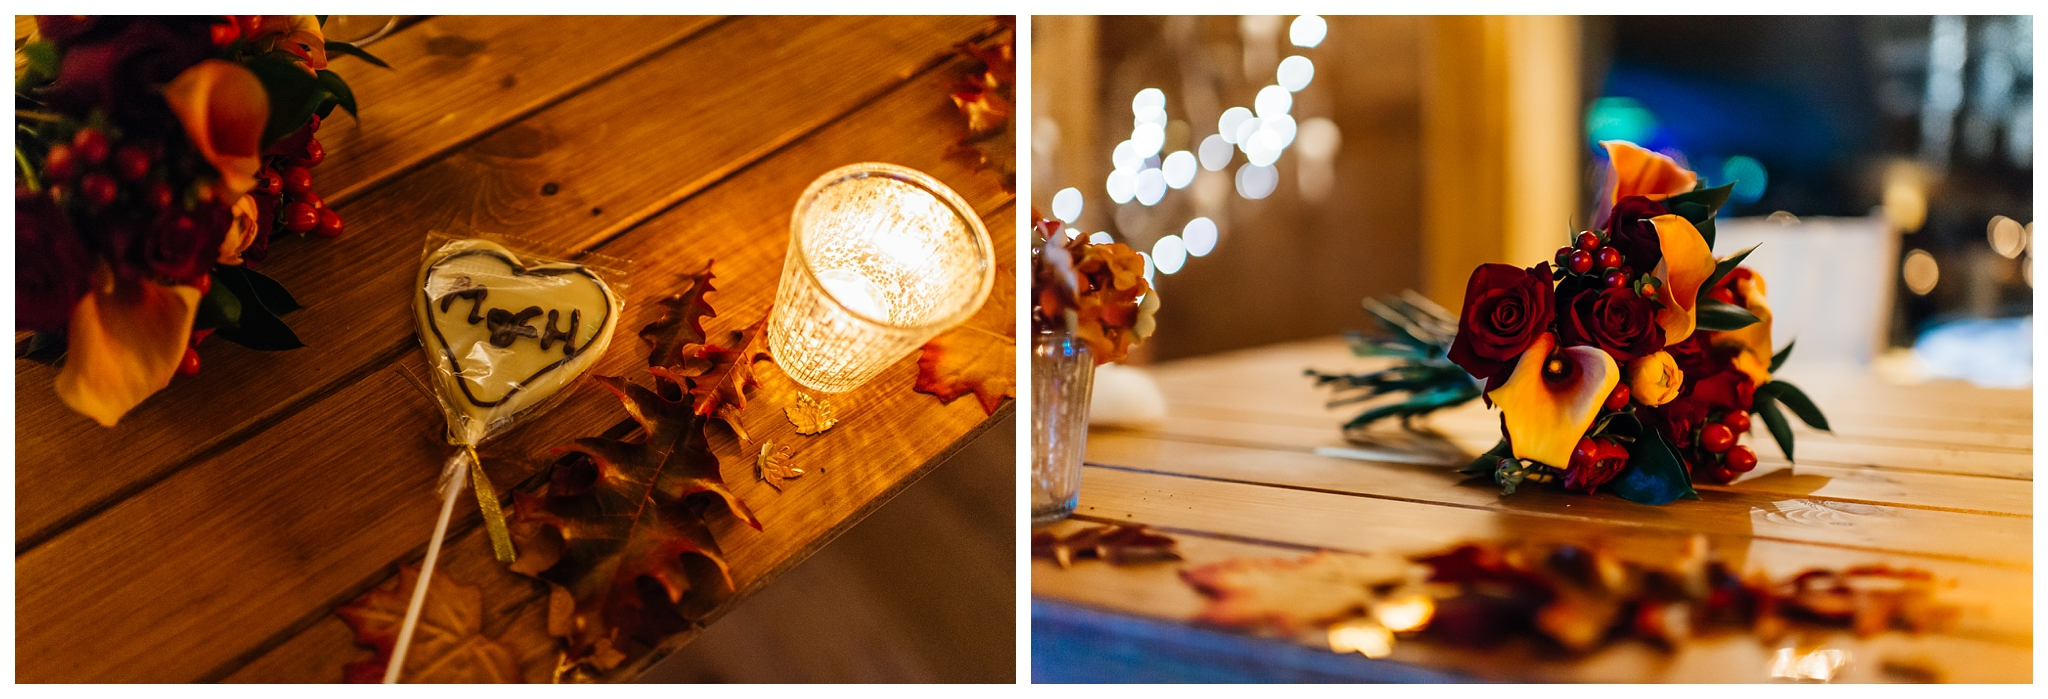 Emma&Paul-Elmore-Court-Winter-Wedding-Nikki-Cooper-Photography_0110.jpg